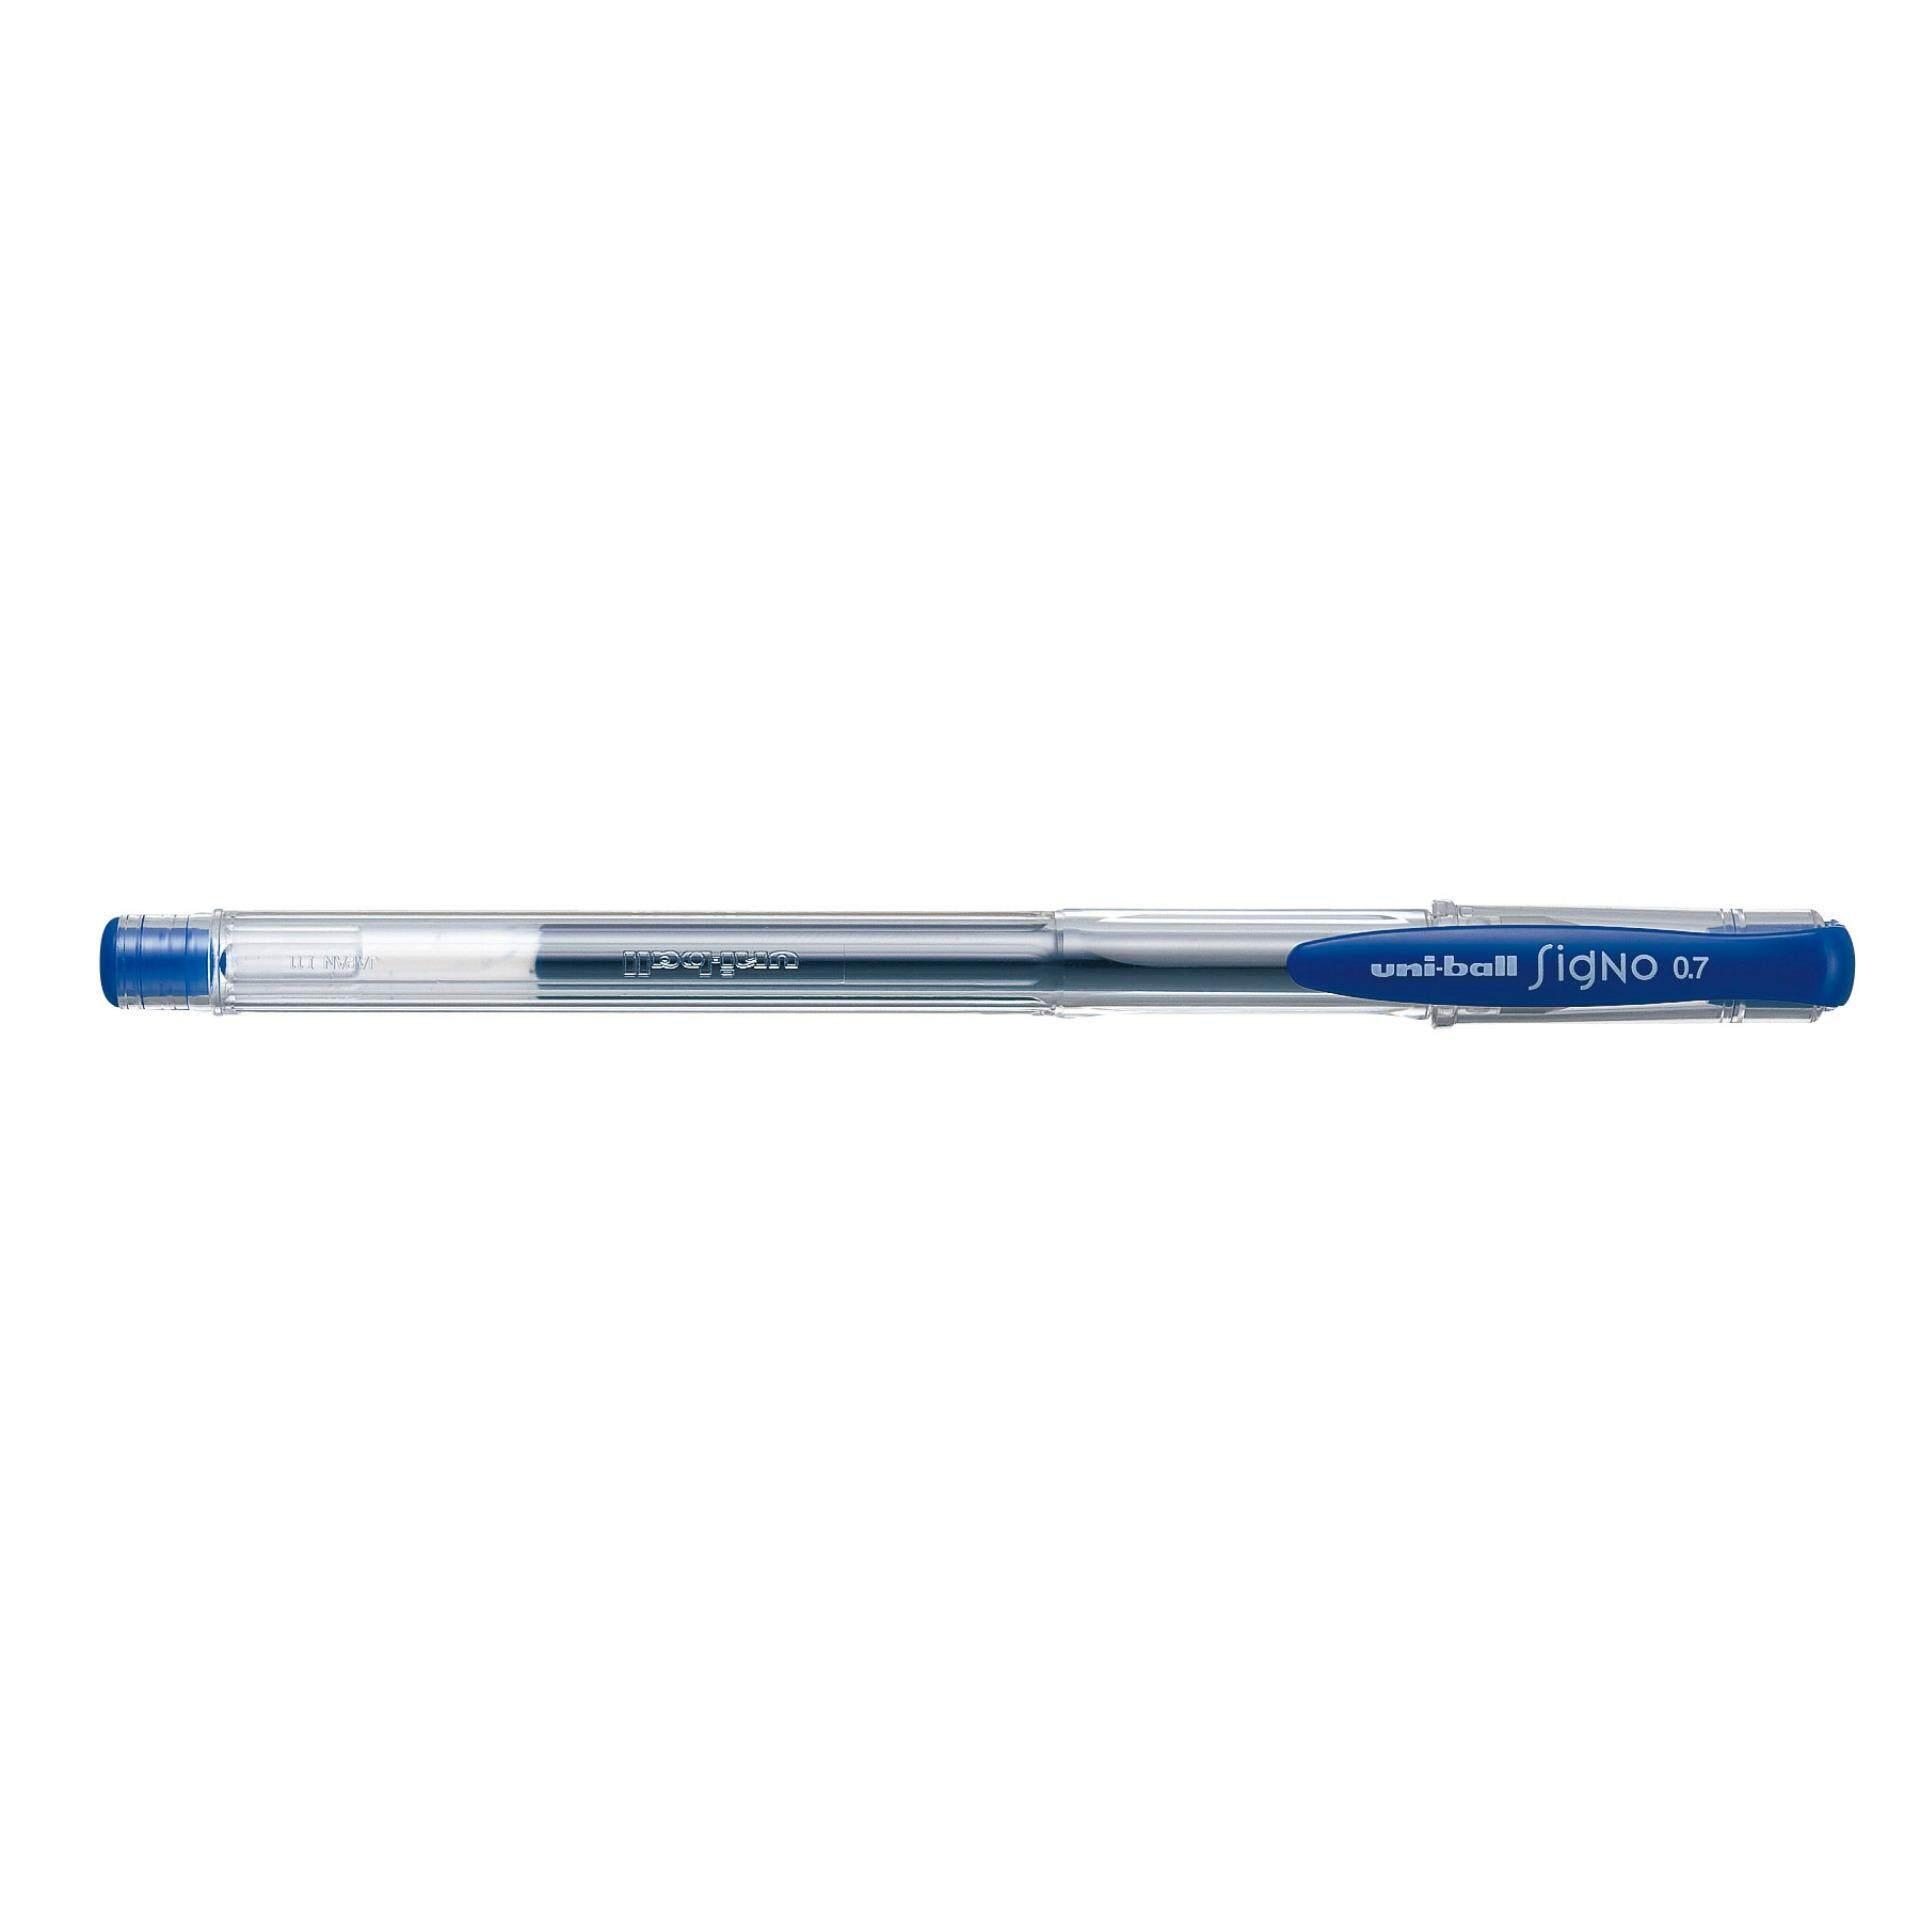 Uniball SIGNO Roller Gel Pen 12pcs/box 0.7mm (Blue Ink)